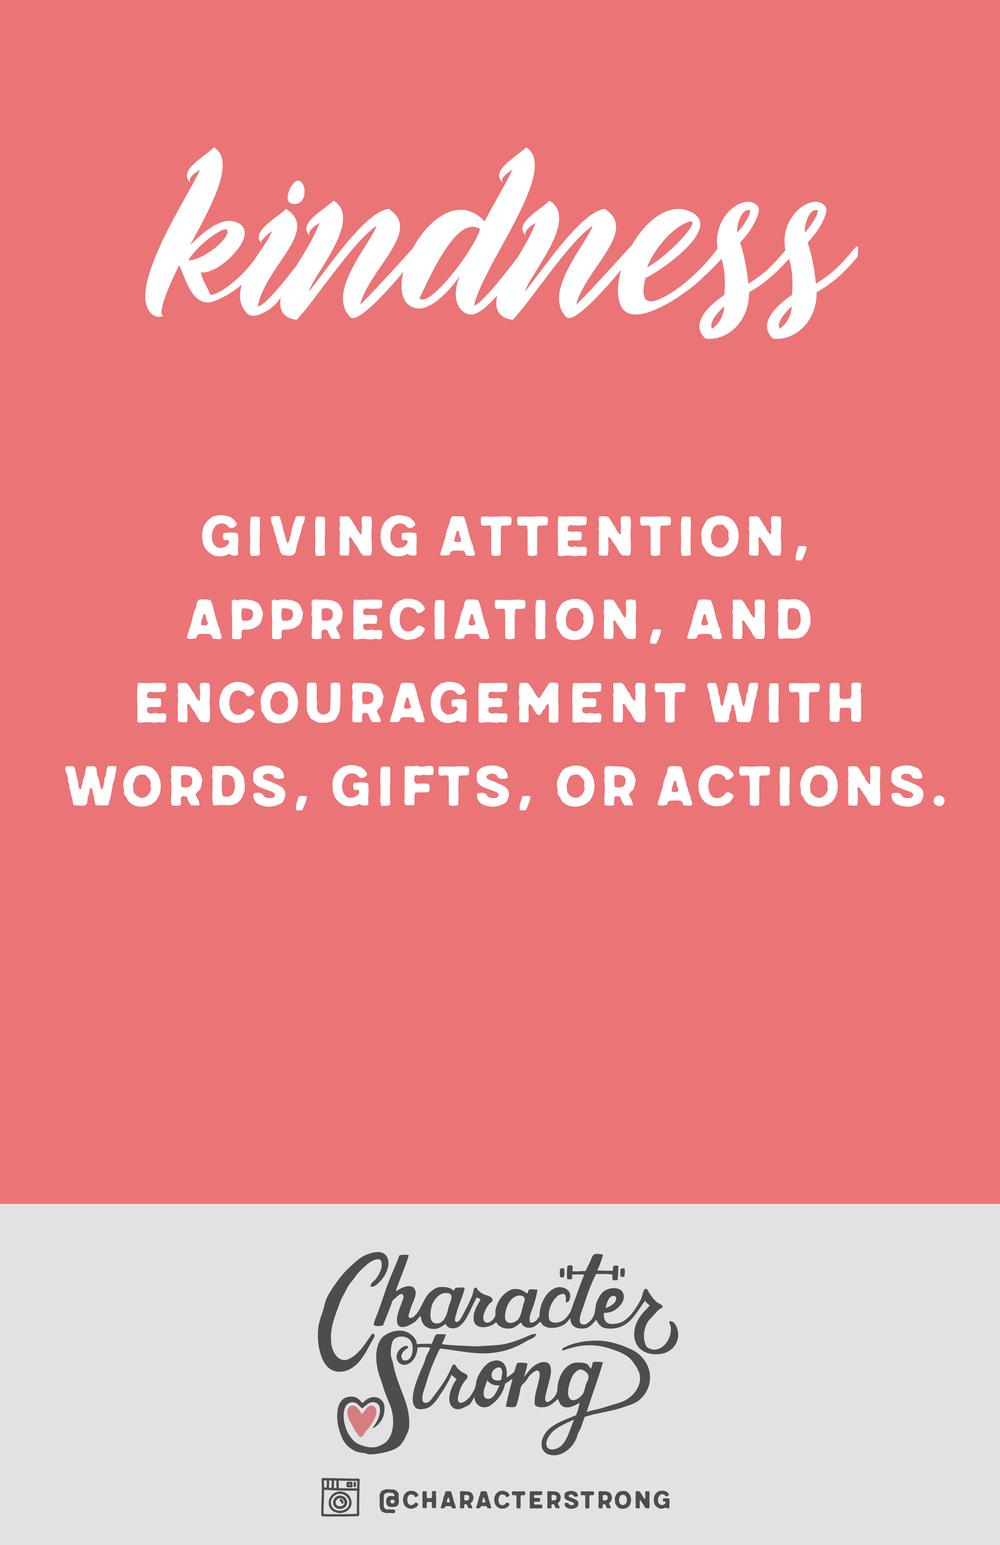 Kindness-5.jpg